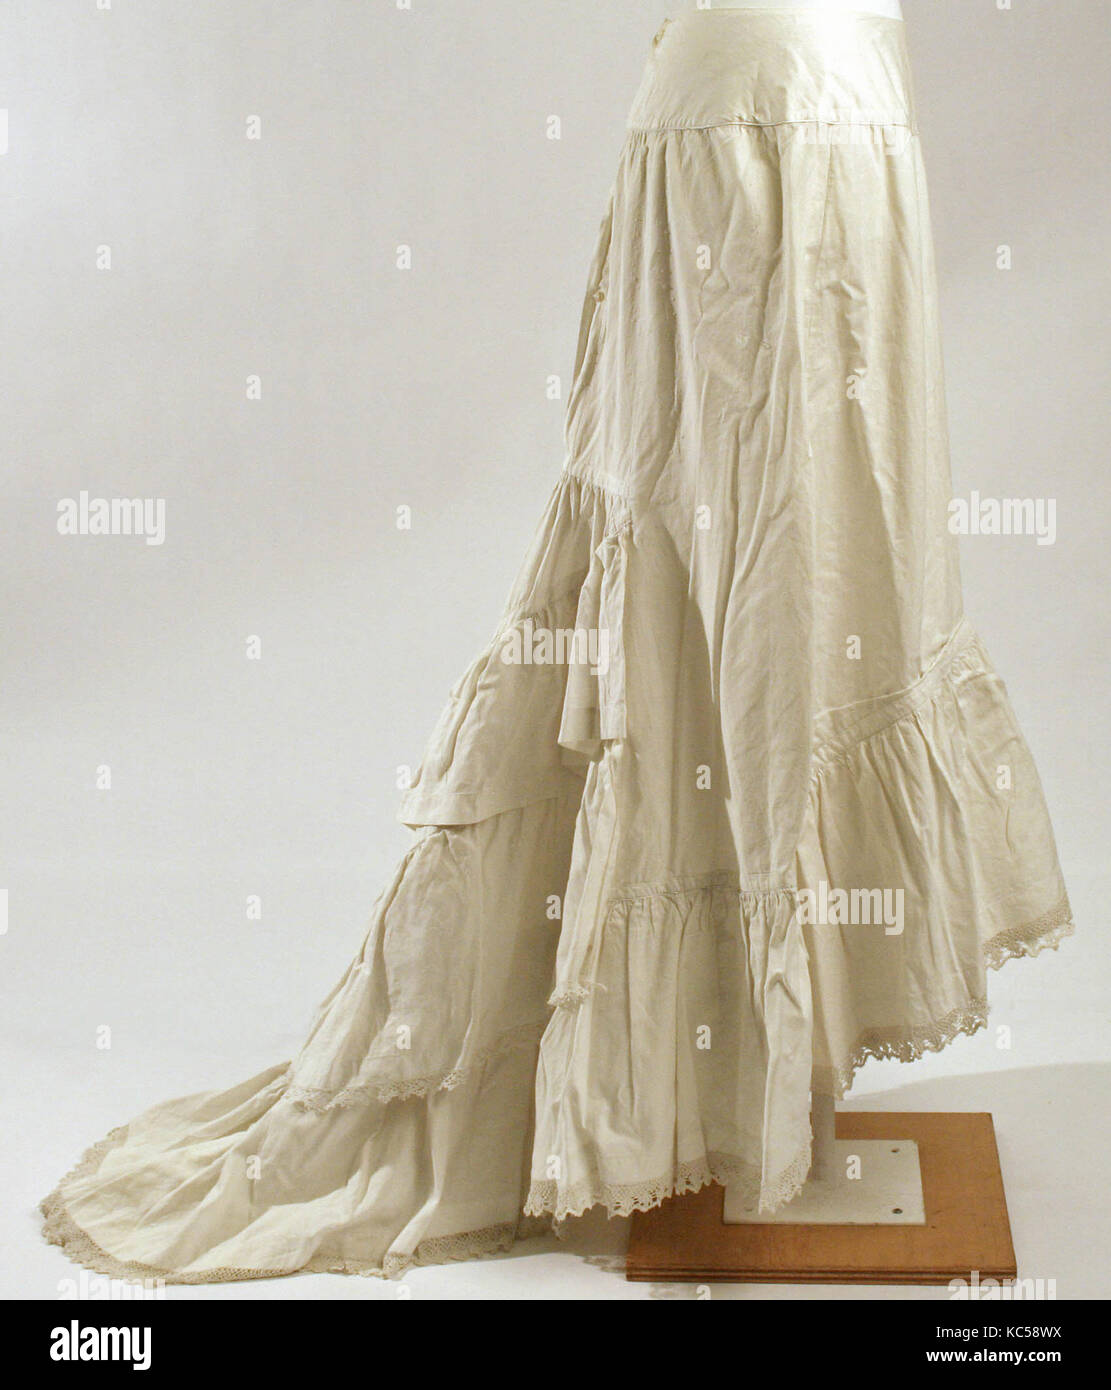 Petticoat, 1870s–80s, American or European, cotton - Stock Image